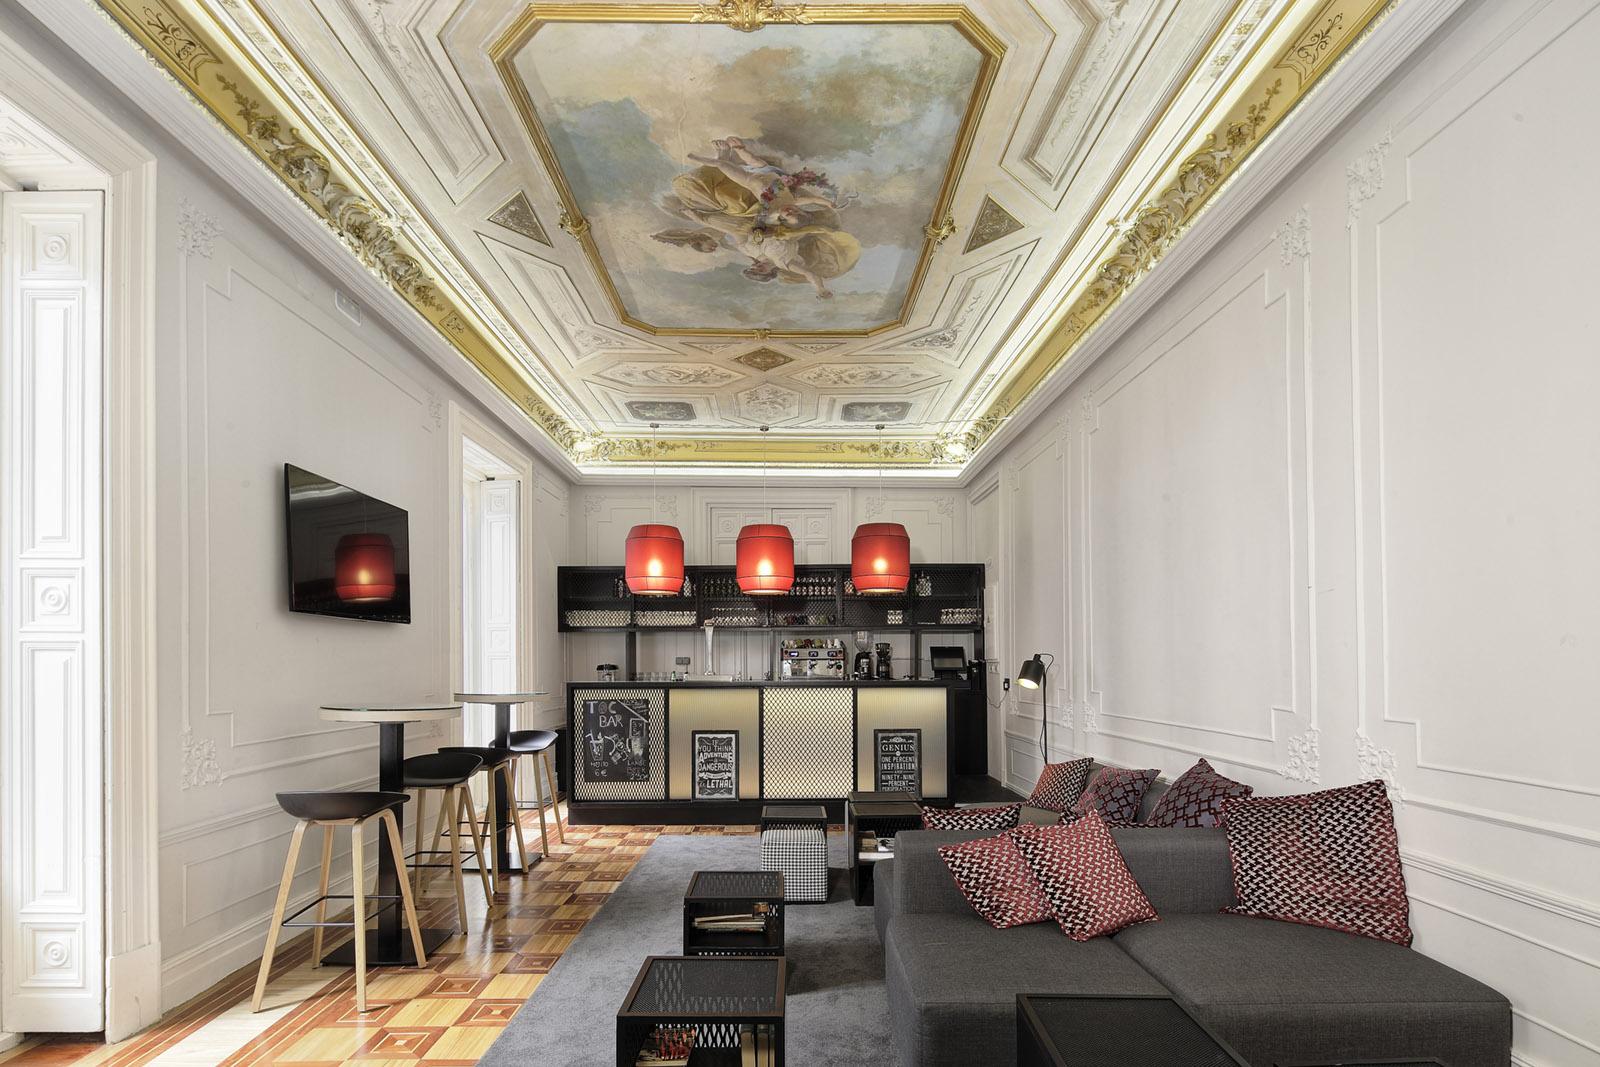 Architectural605-Interior-photographer-Madrid-Spain-.jpg